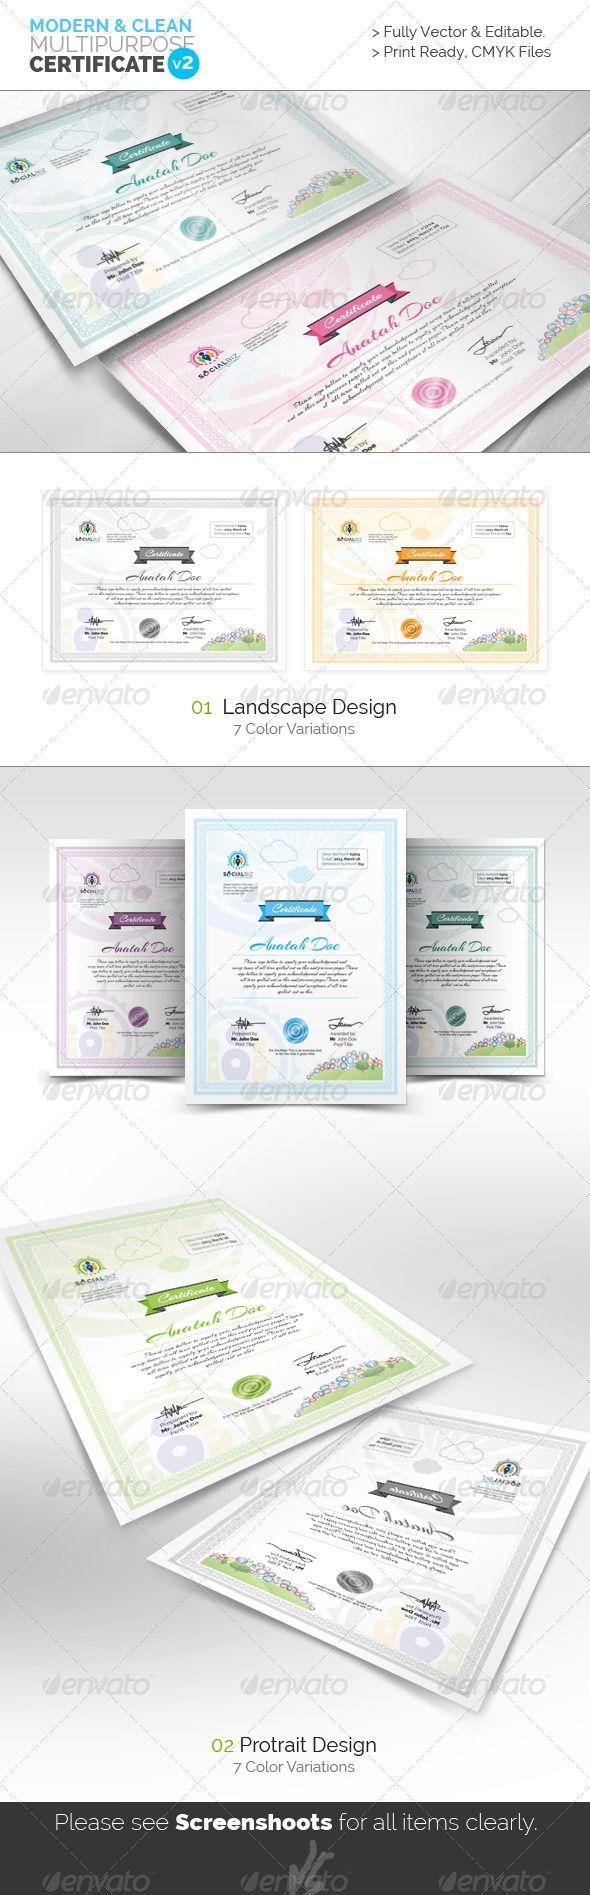 155 best Certificate Template Design images on Pinterest ...